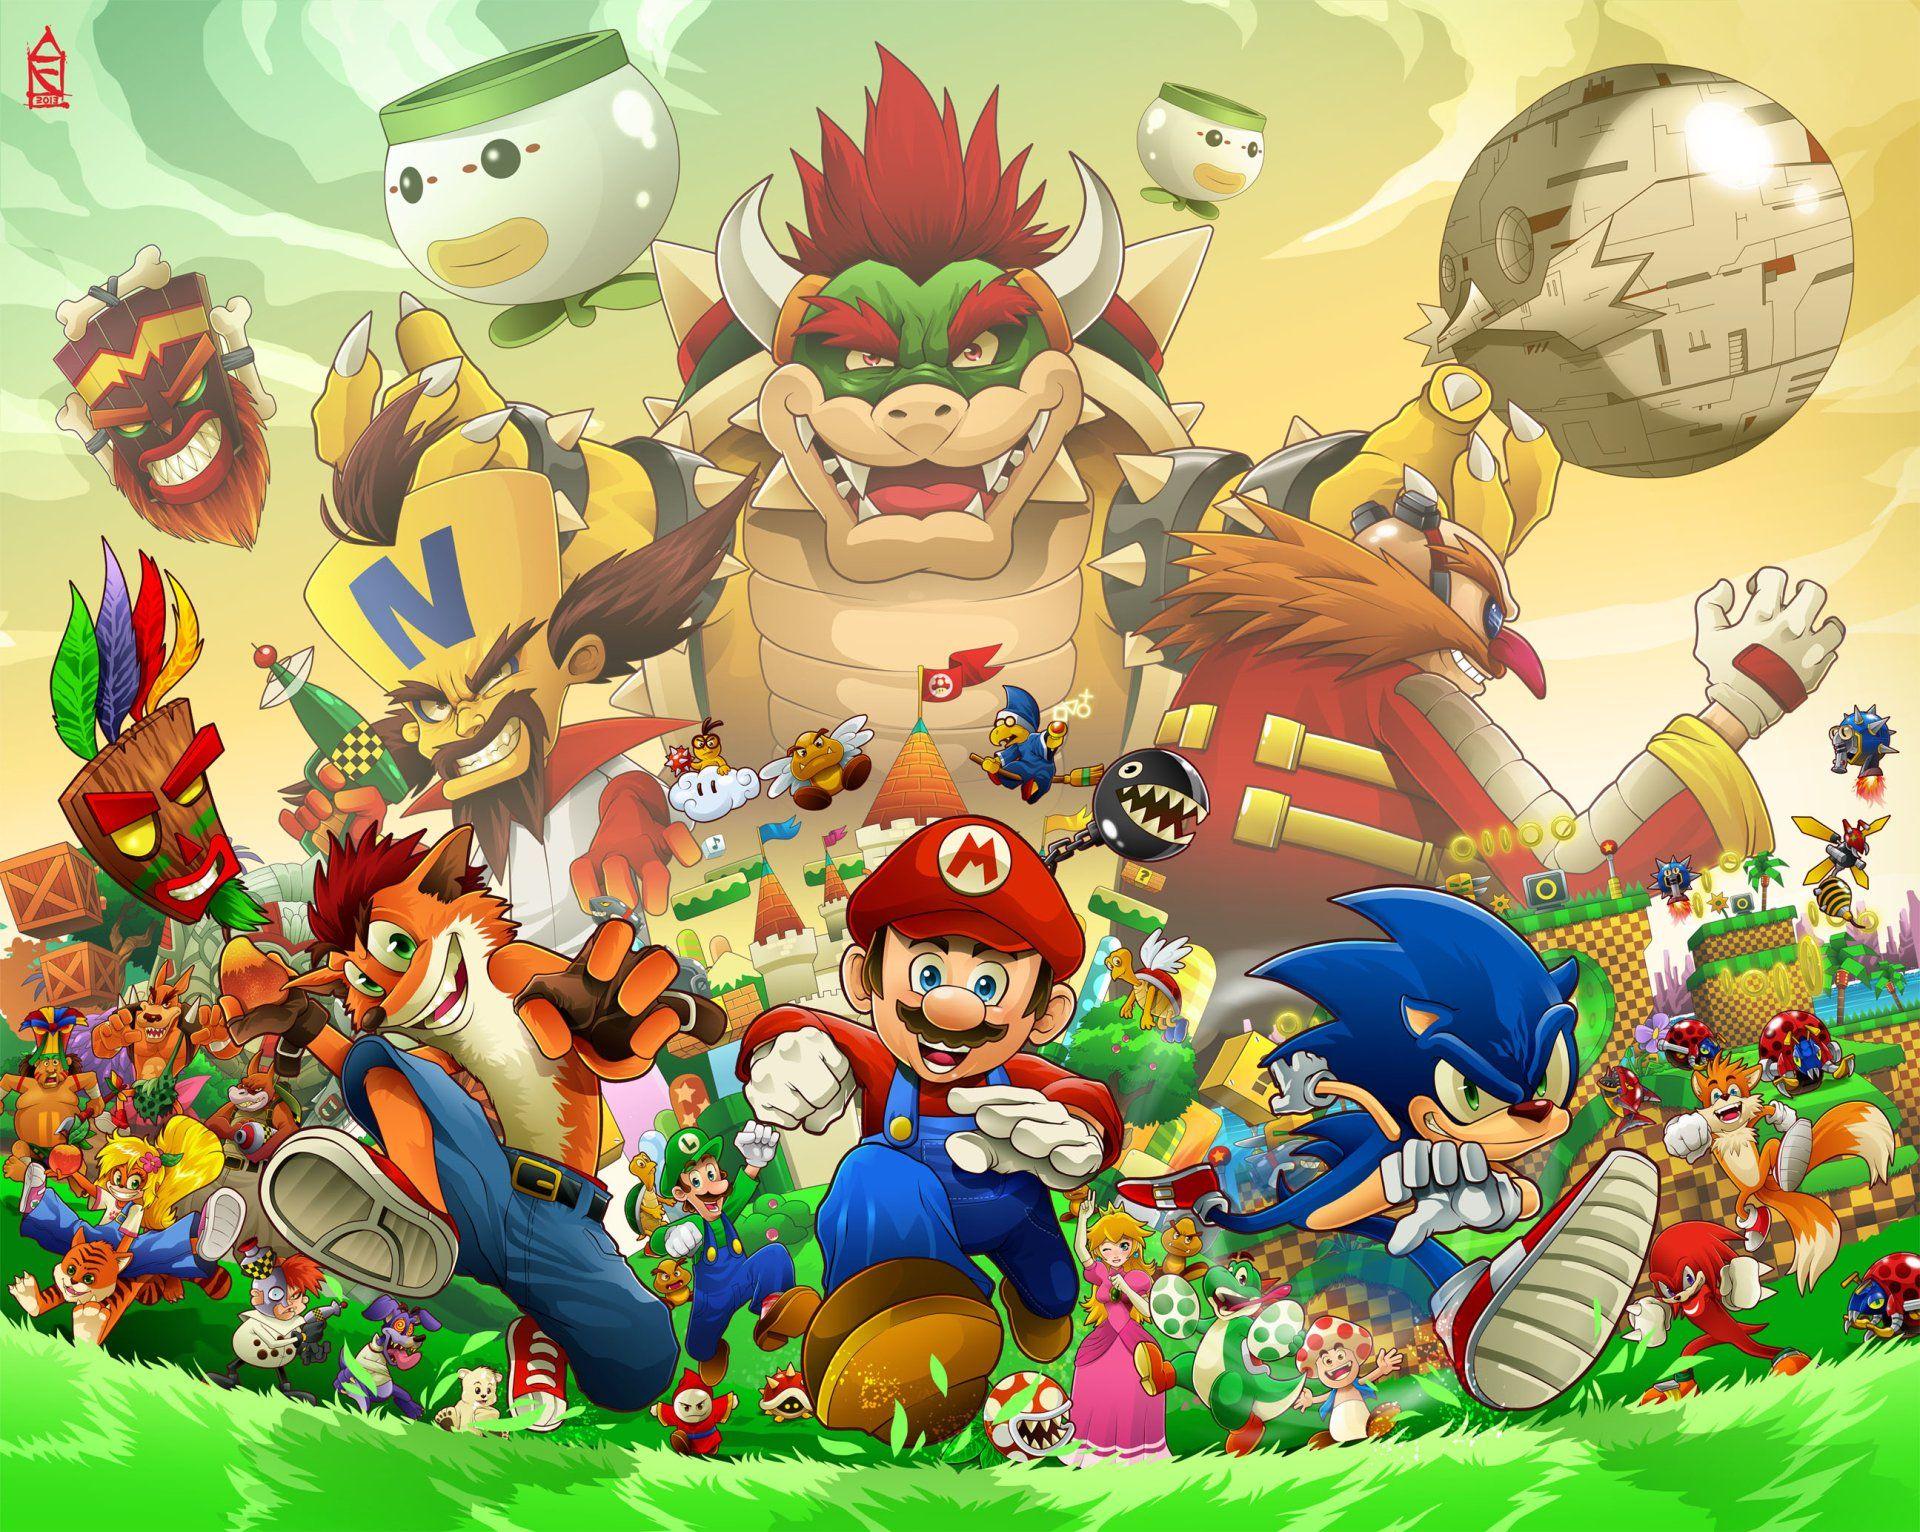 Video Game Crossover Bowser Mario Sega Nintendo Sony Sonic The Hedgehog Super Bros Crash Bandicoot Character Wallpaper